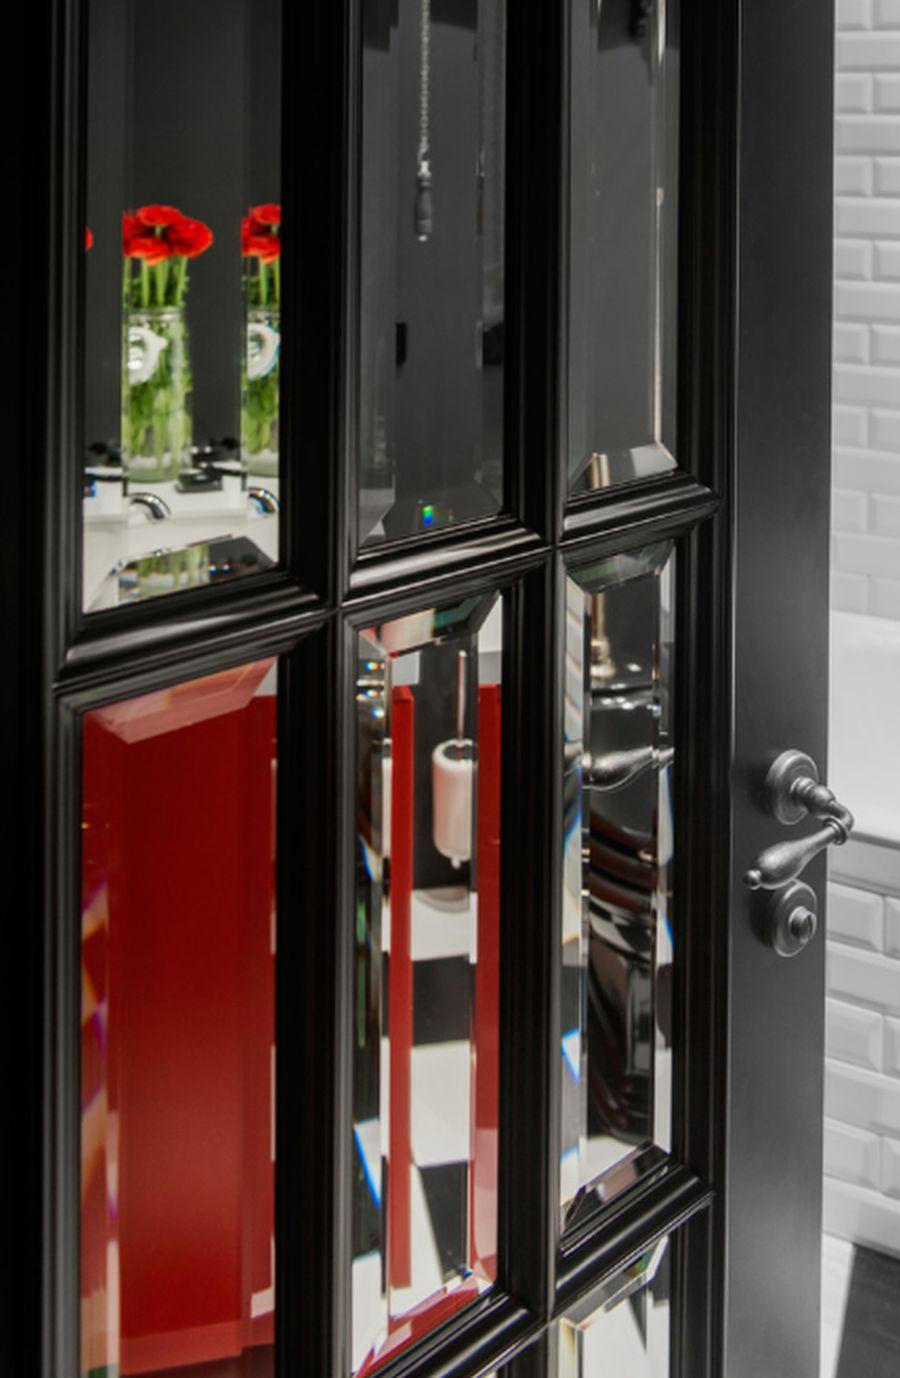 adelaparvu-com-despre-reoganizarea-unui-apartament-de-2-camere-in-3-camere-54-mp-designer-masha-kunyakina-foto-olga-melekesceva-12